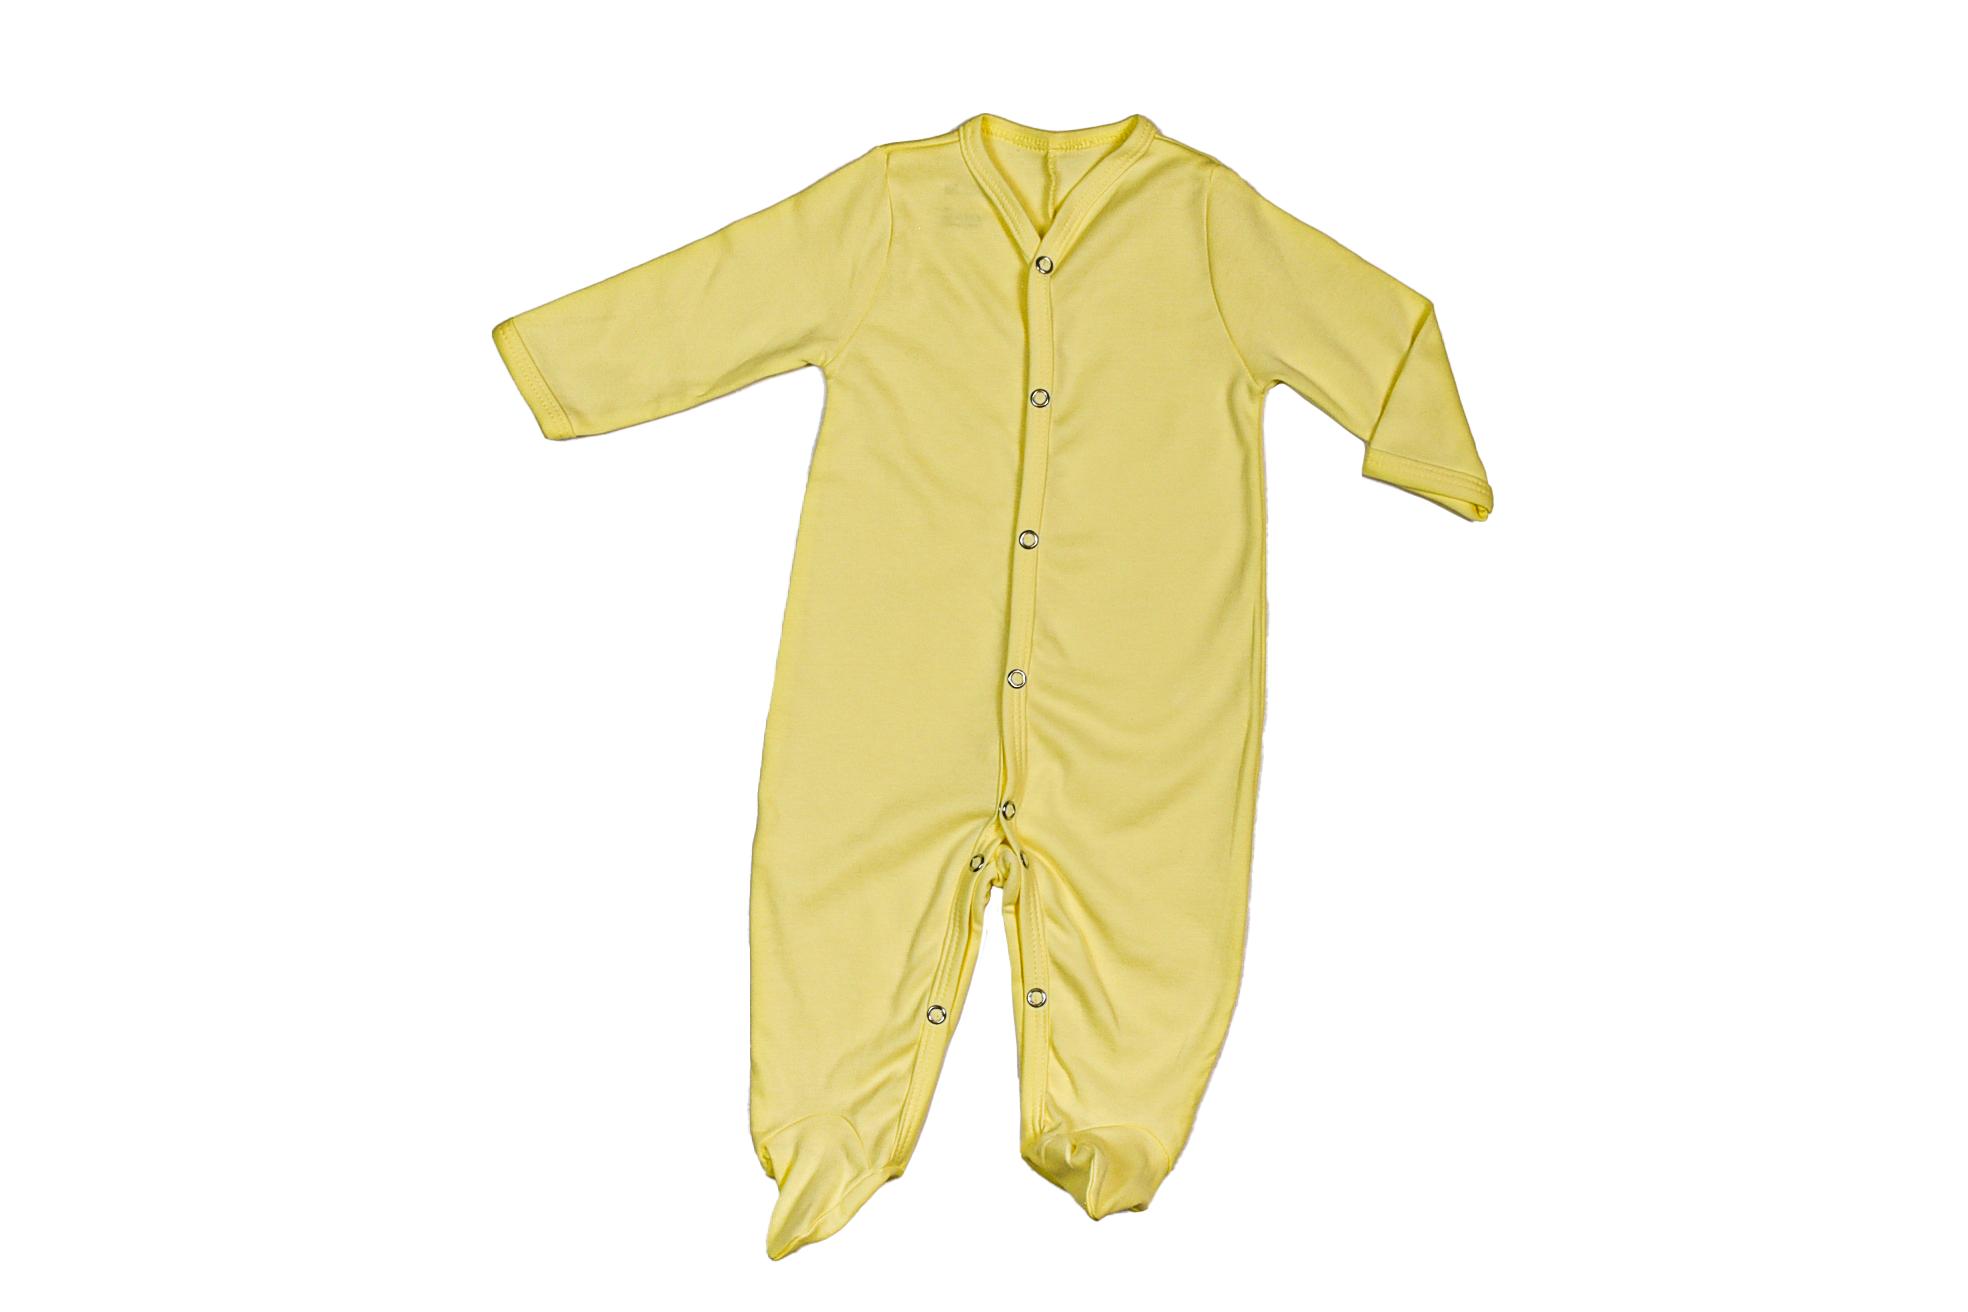 Baby gift set, new born - Ecart